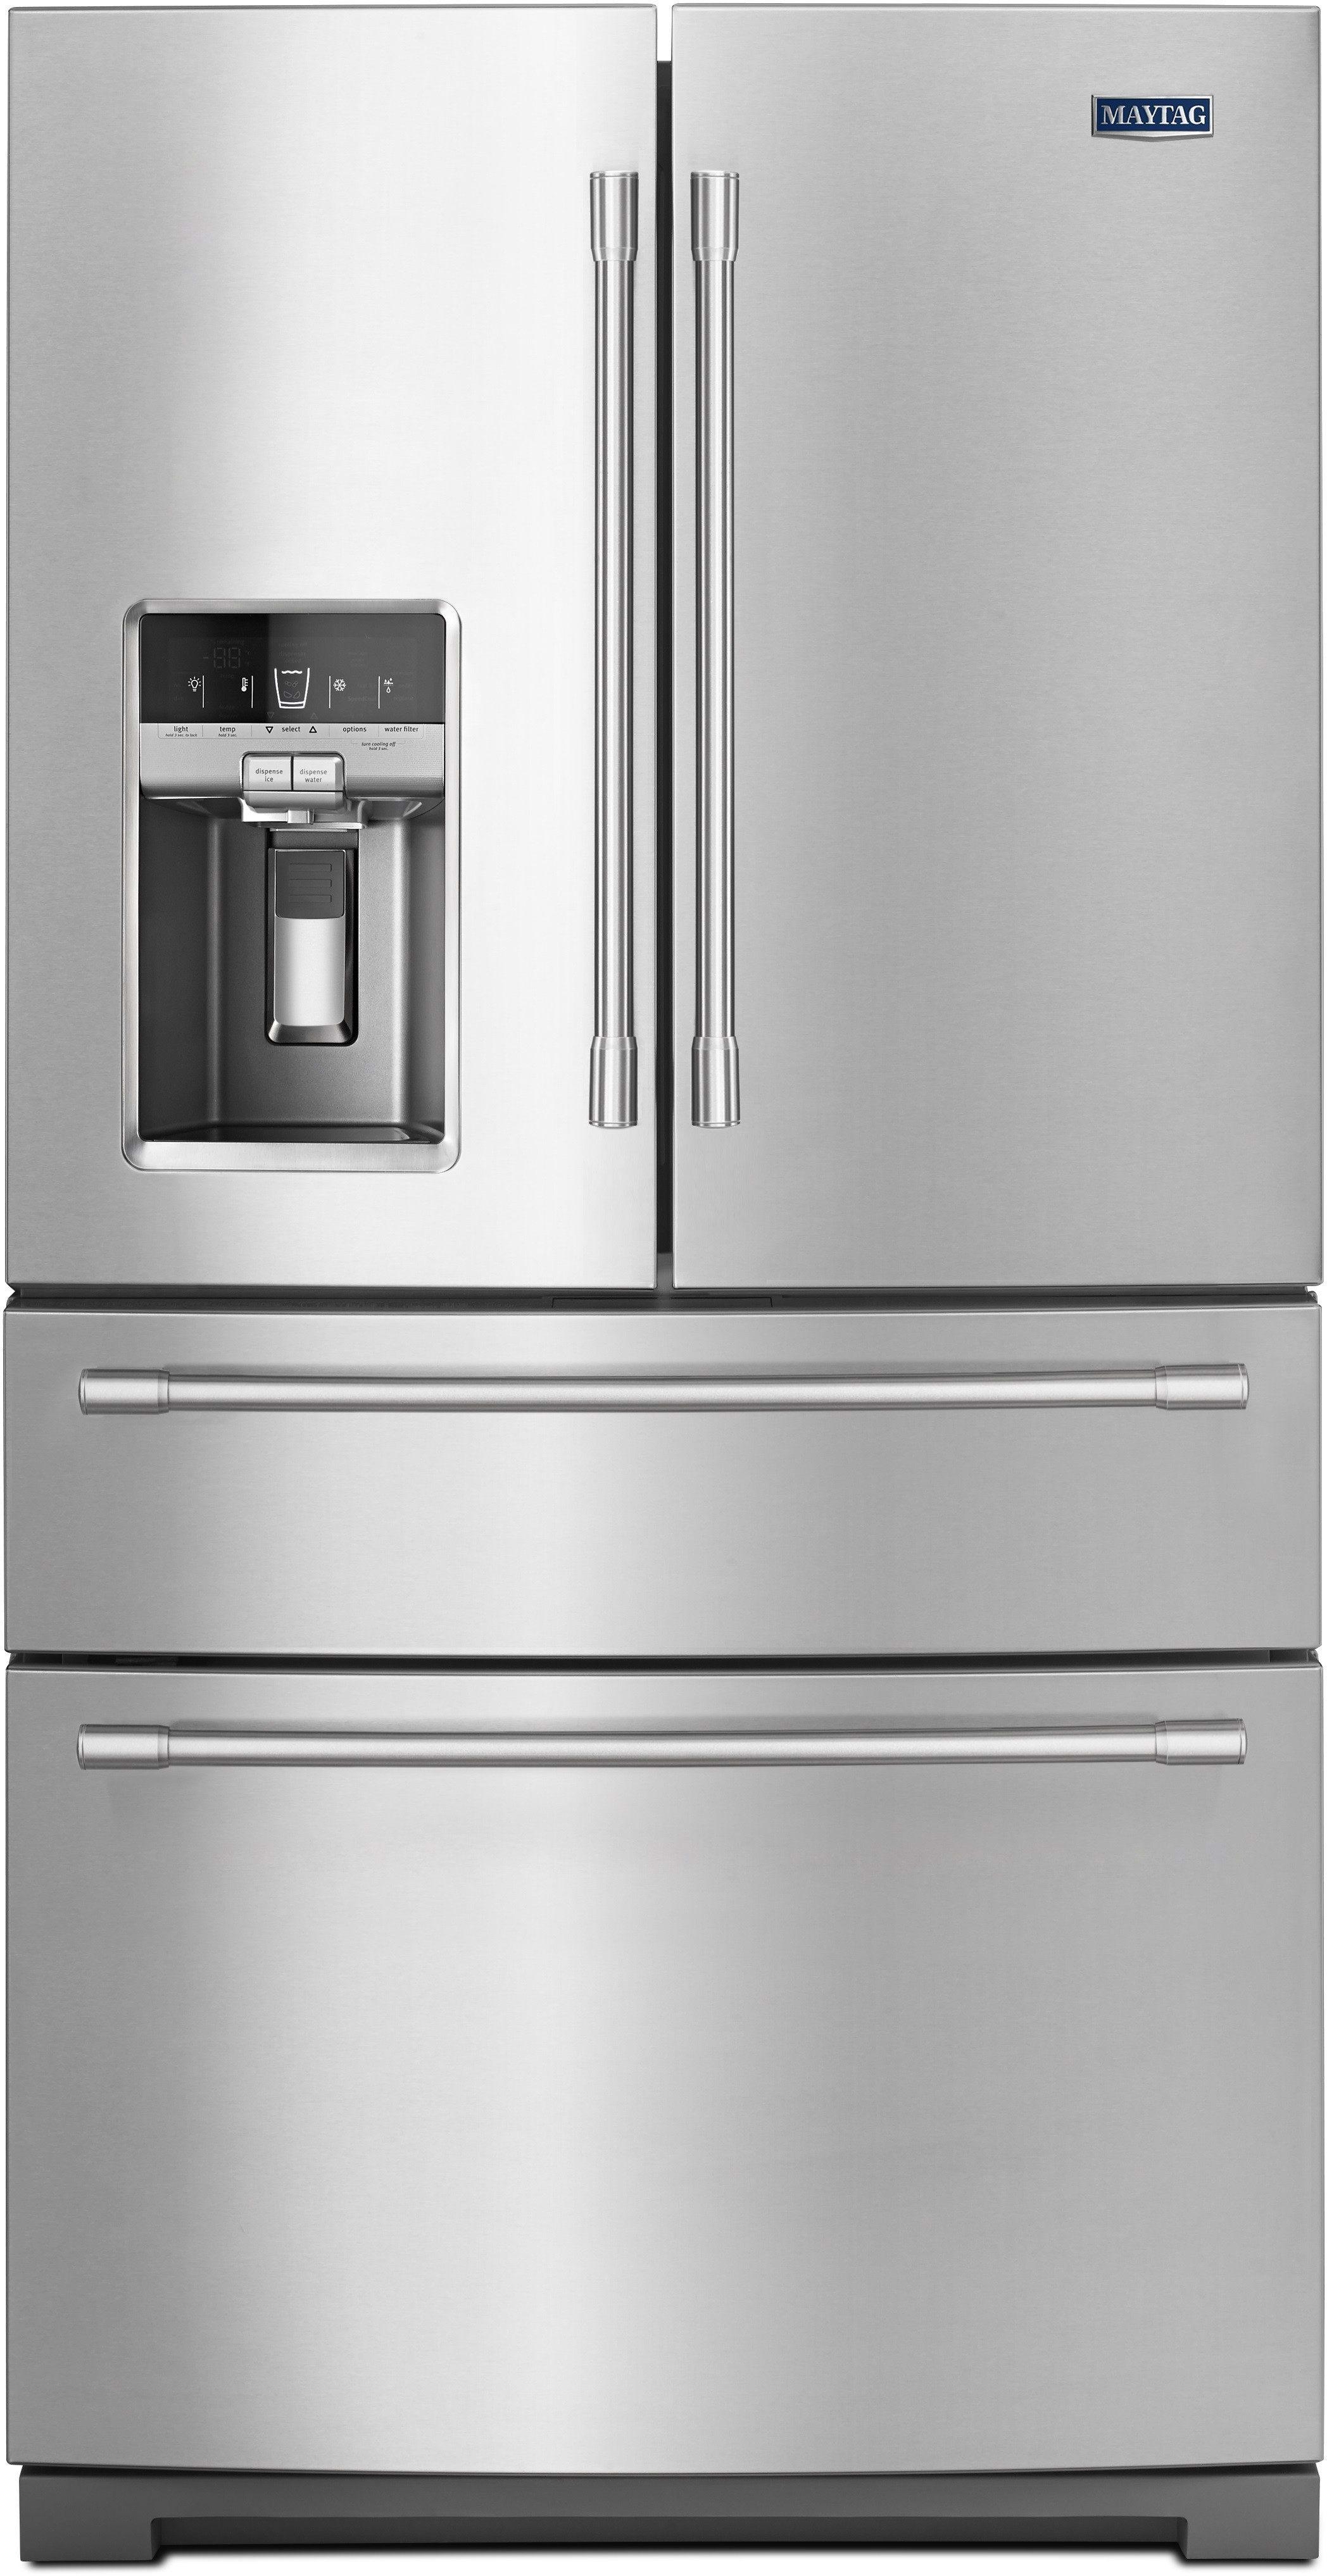 Maytag mfx2676frz 36 inch 4 door french door refrigerator - Maytag whirlpool ...